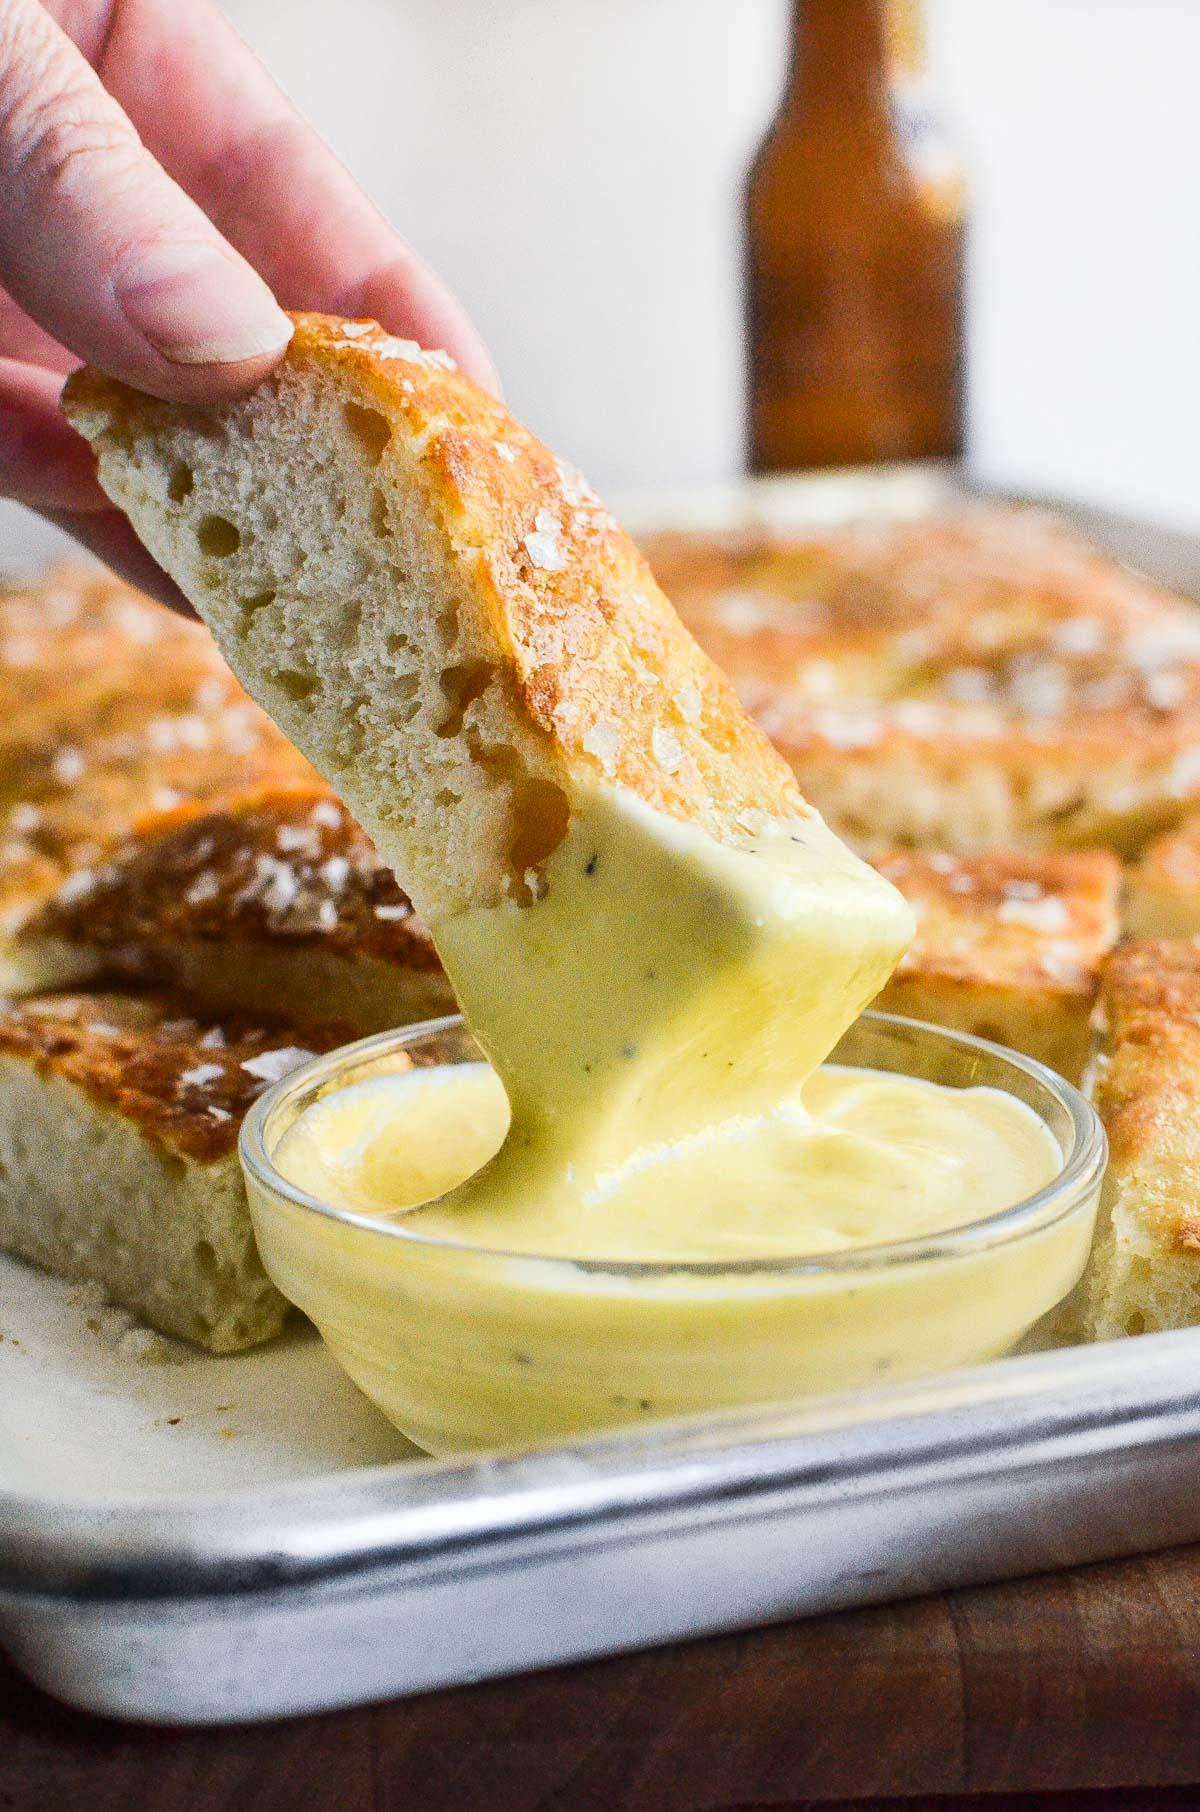 dipping pretzel bread into dipping sauce